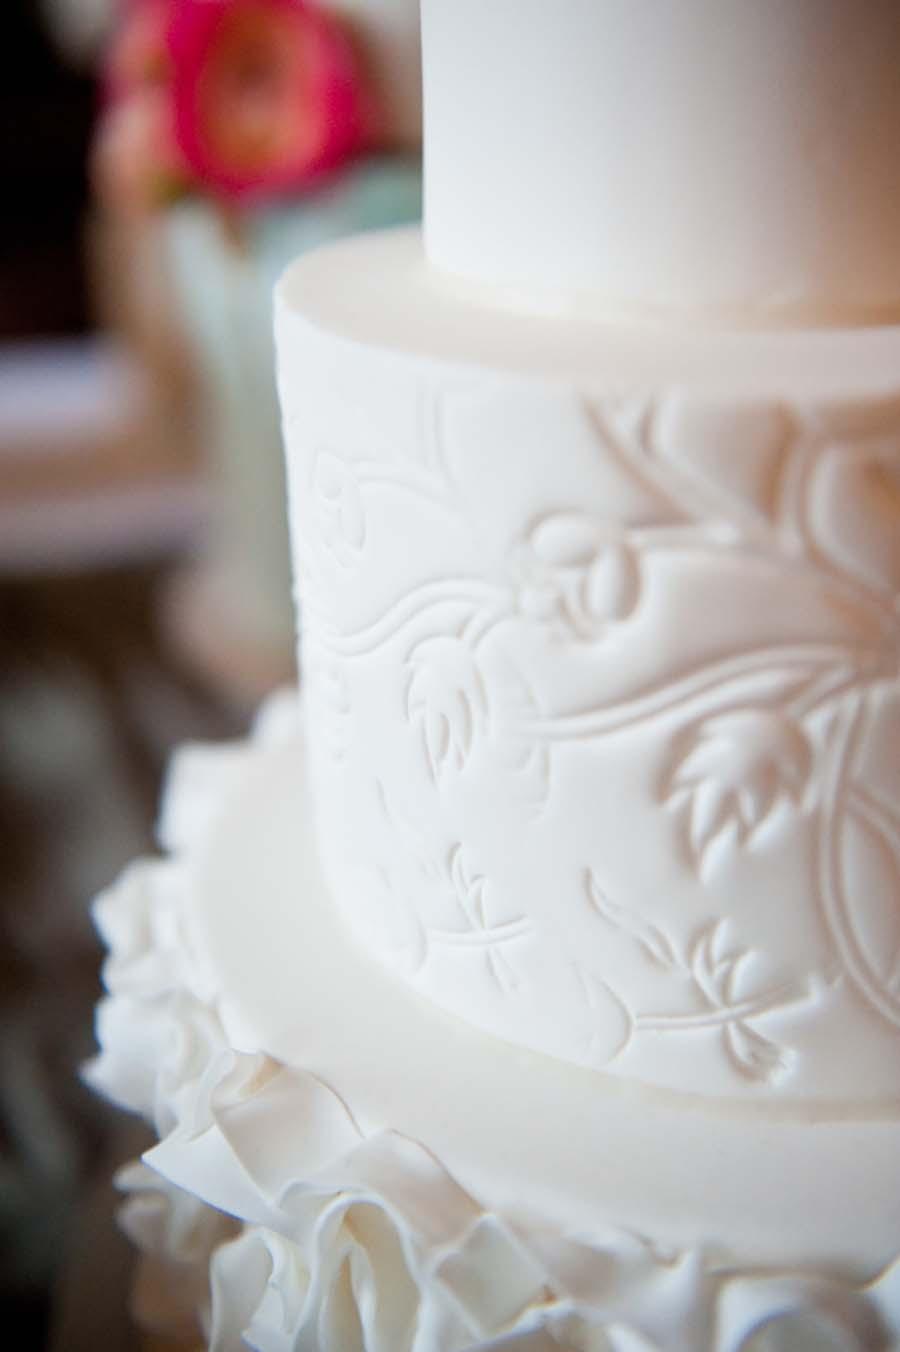 Buckinghams-at-belvoir-castle-wedding-fair-rachael-connerton-photography-103